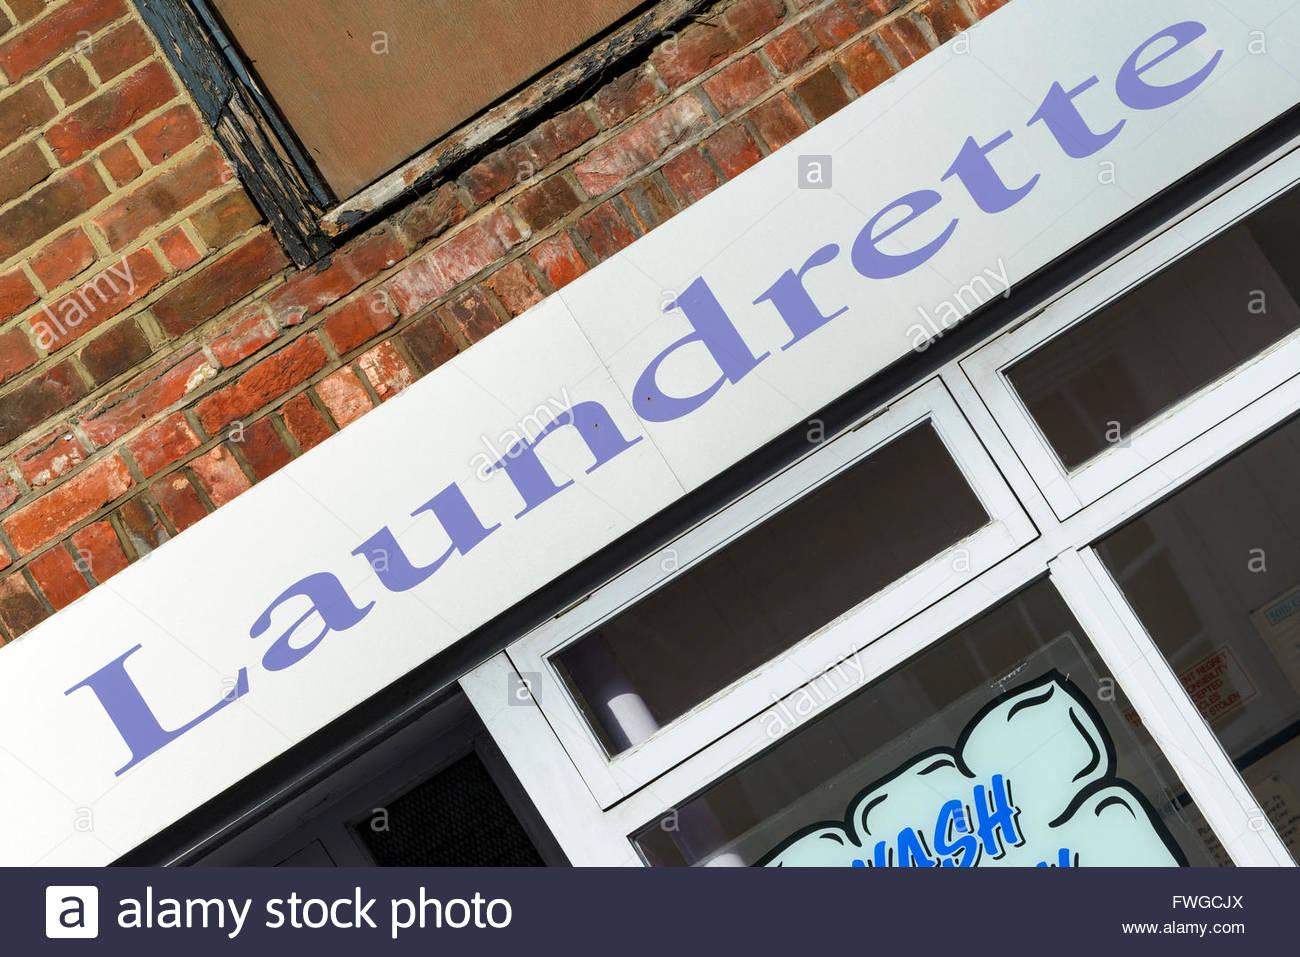 Laundrette, Blandford Forum, Dorset England UK Stock Photo